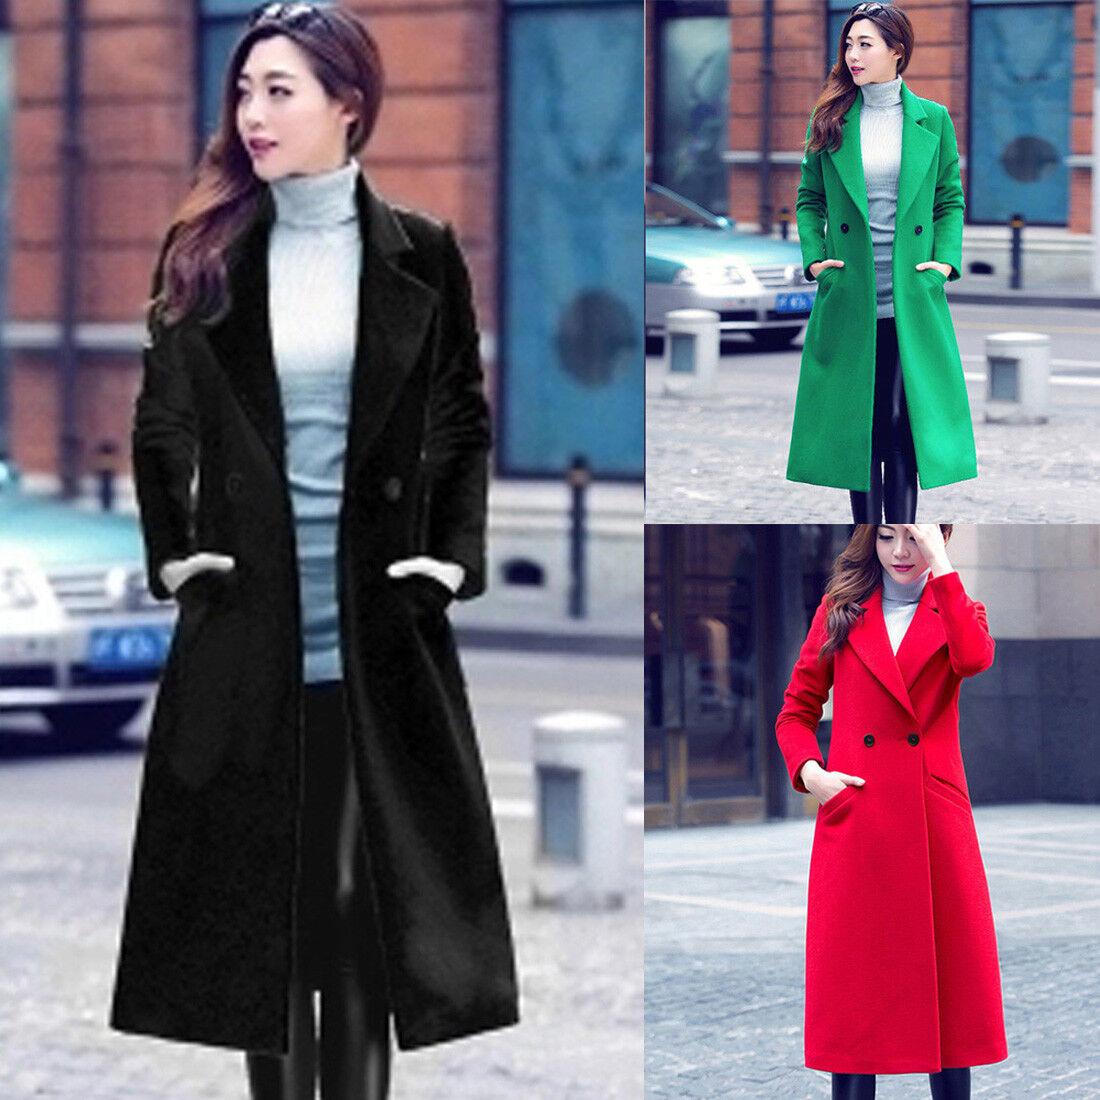 Fashion Women Autumn Winter Long Woolen Coat Overcoat Parka Outwear Cardigan